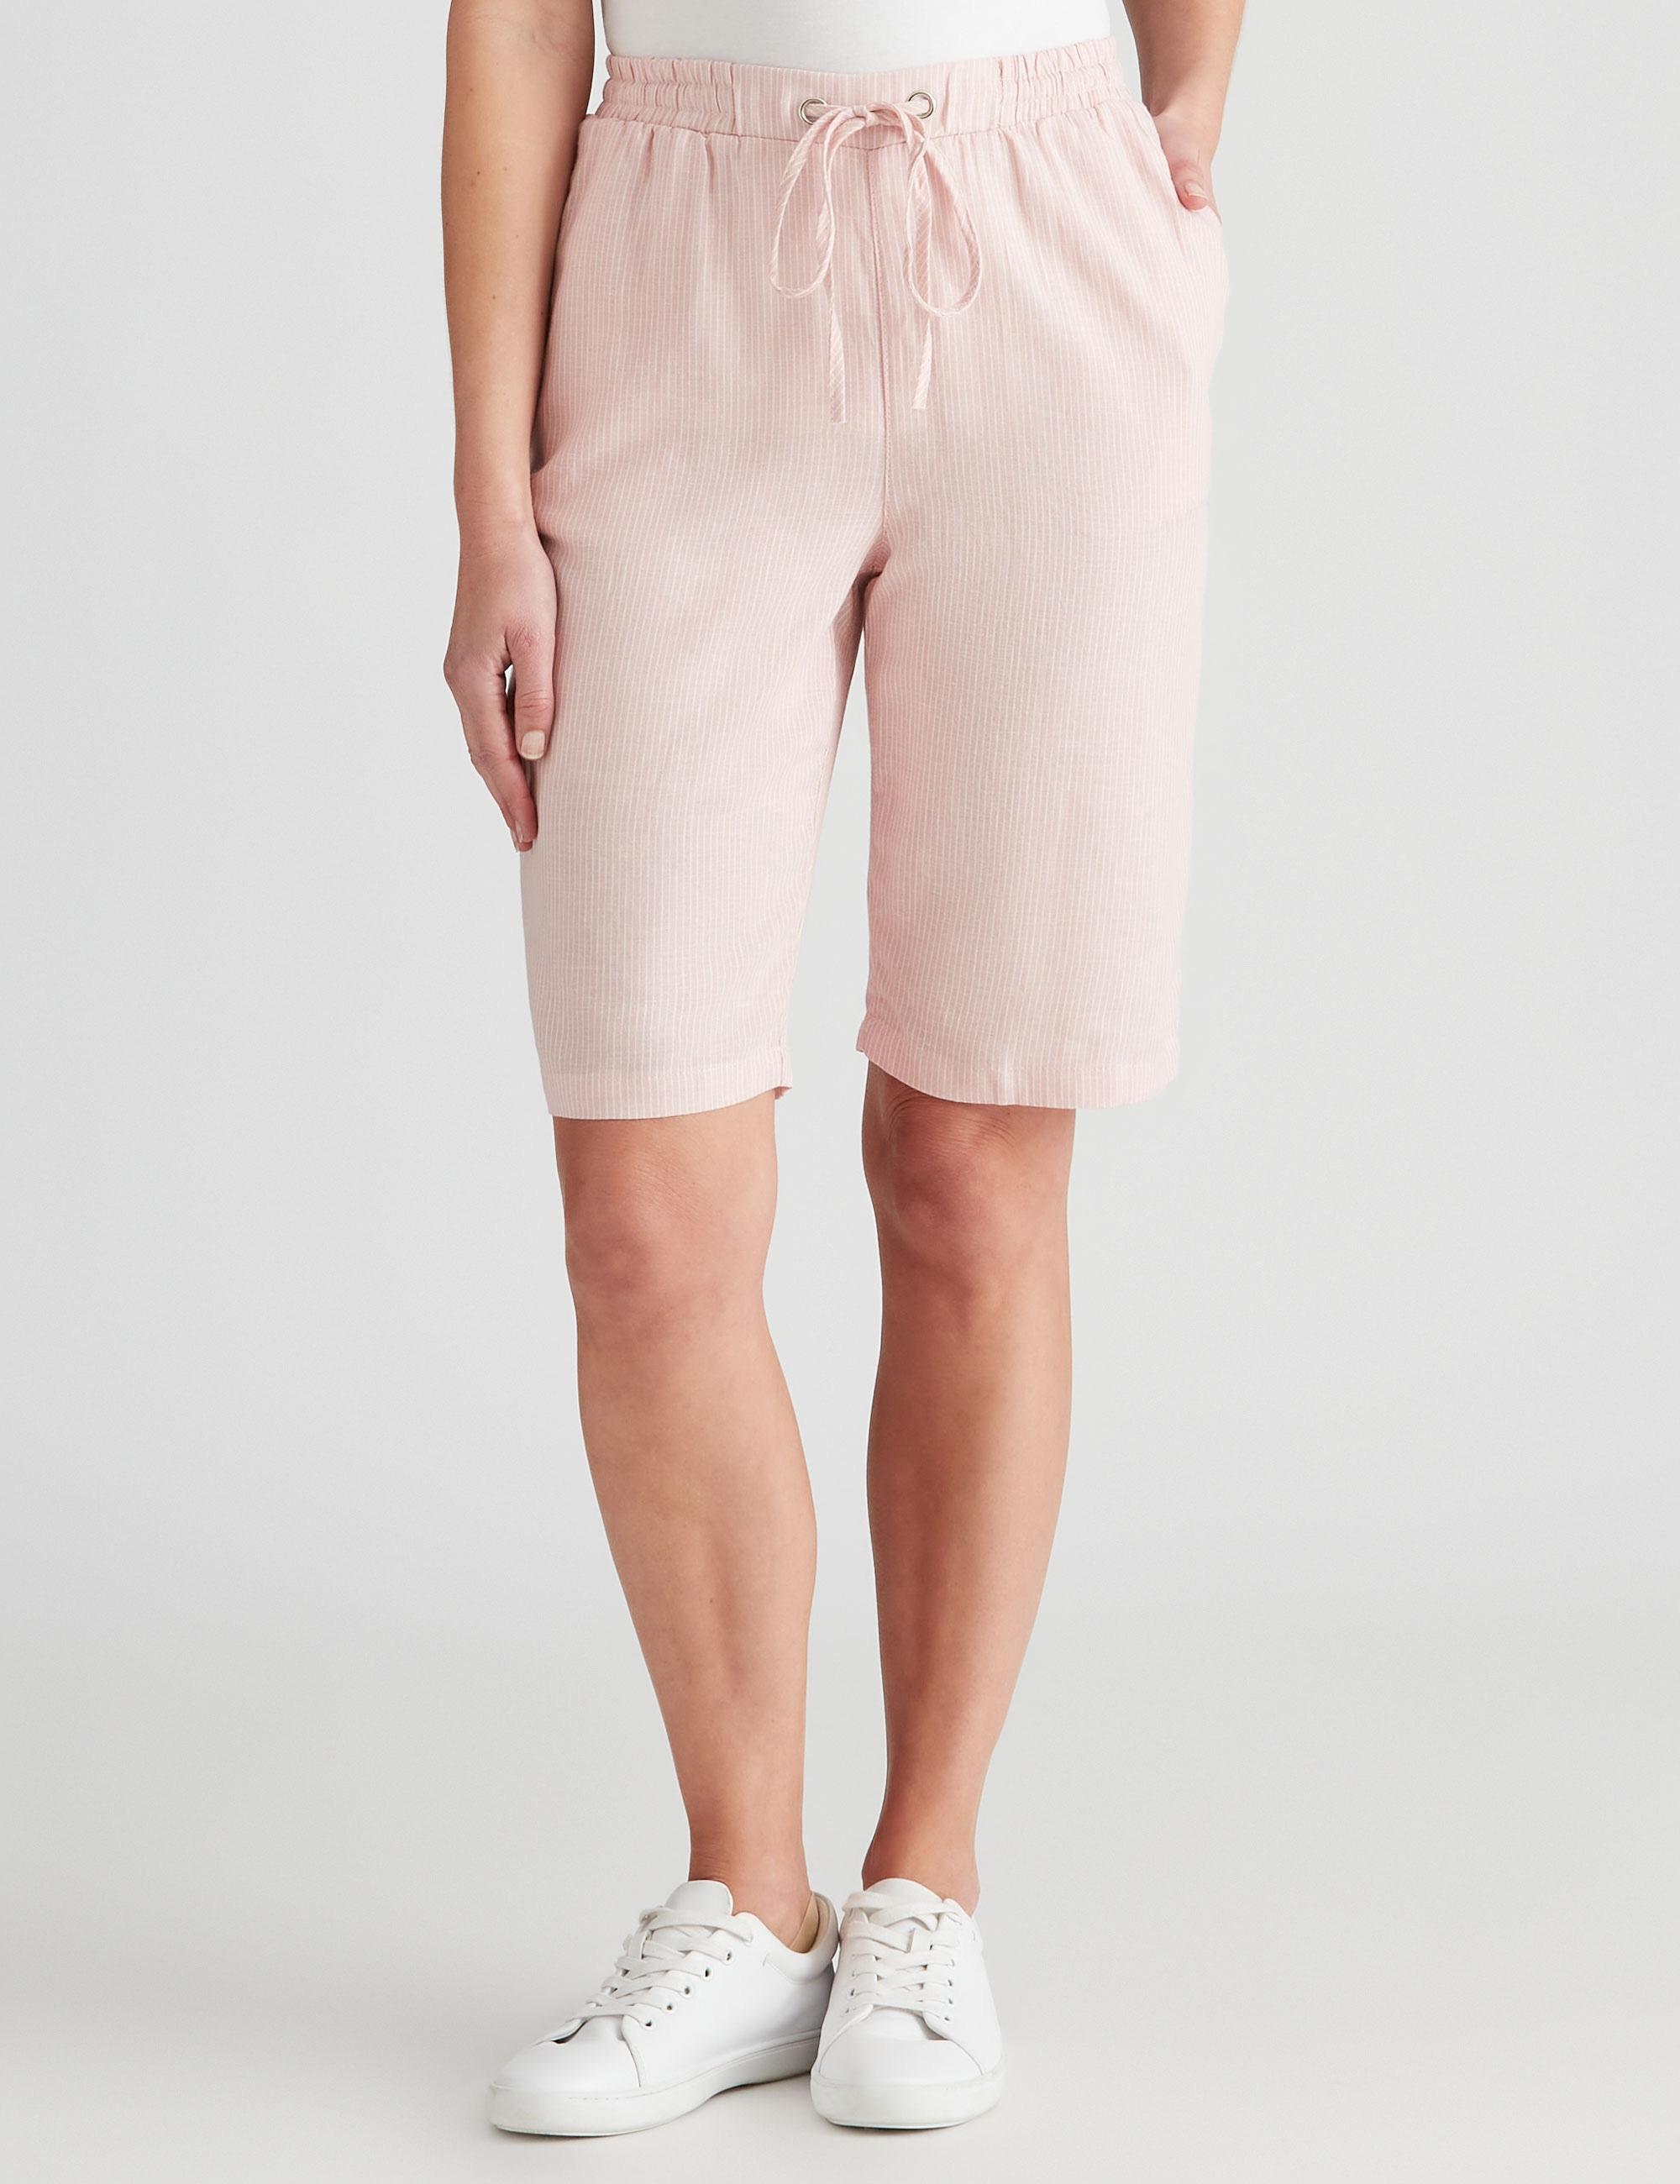 1055481660 1 - Women Fashion